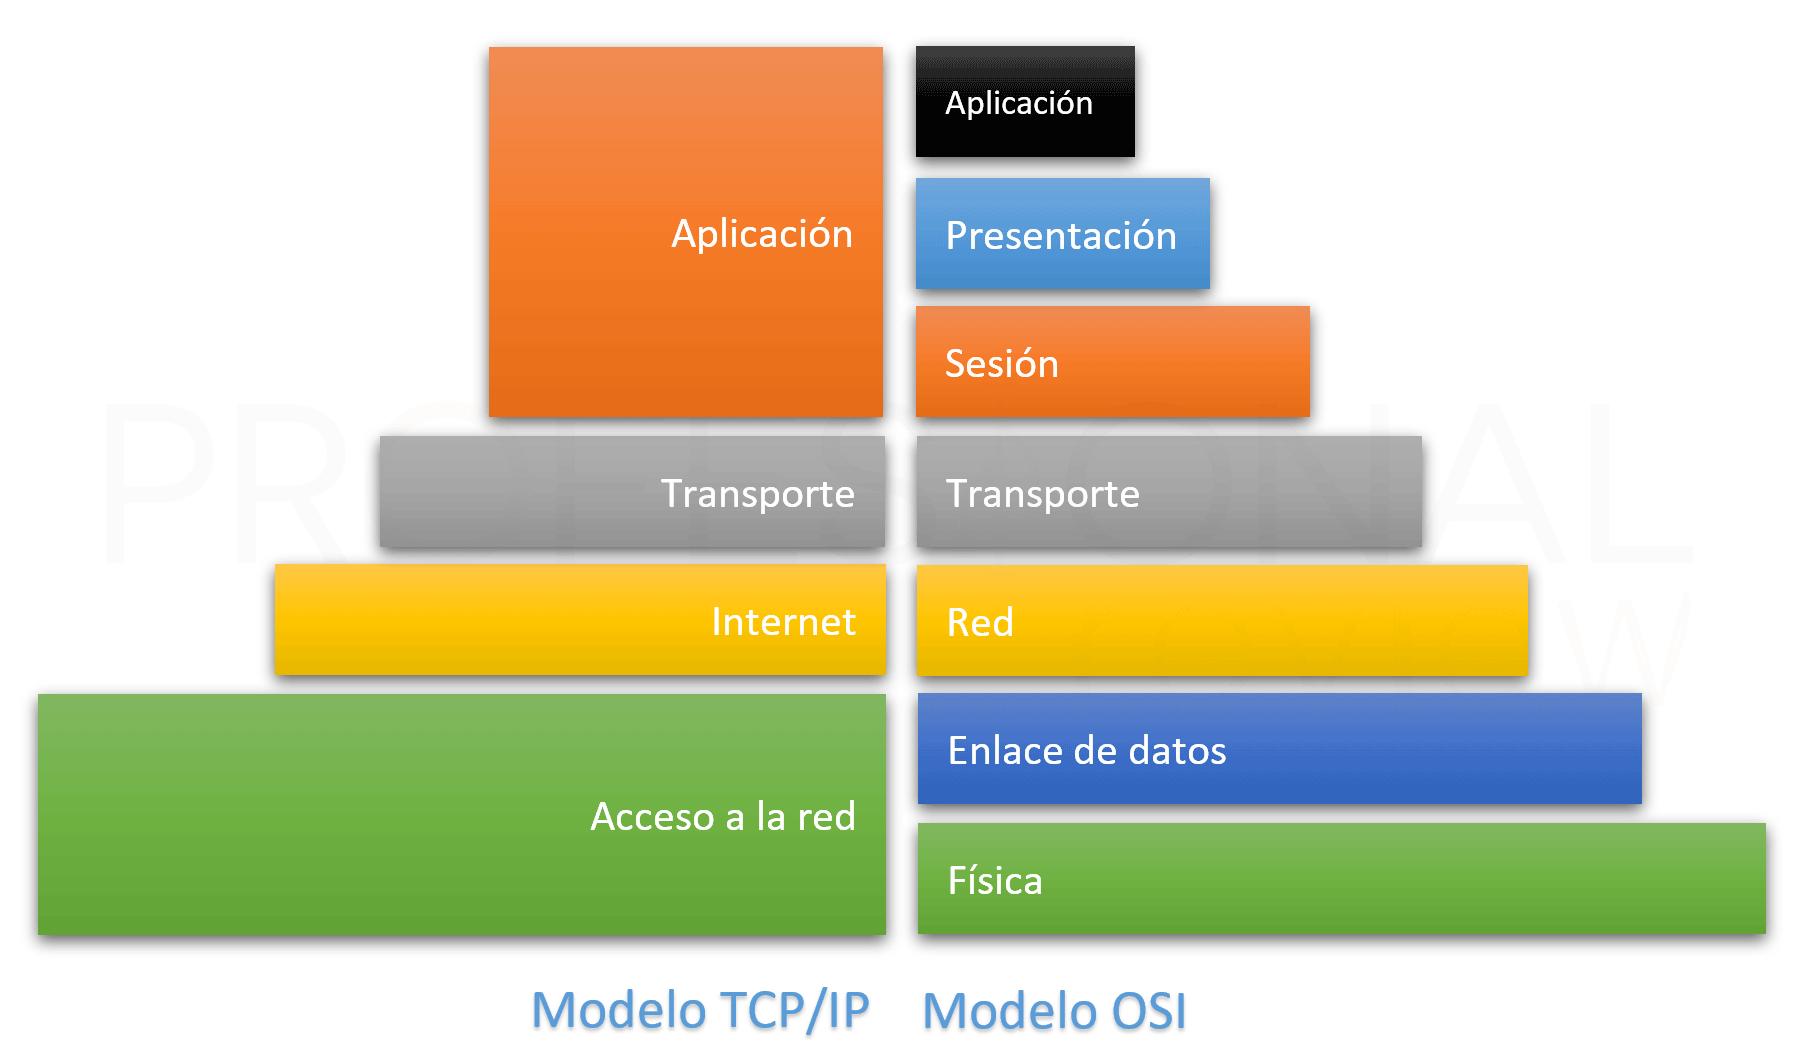 Protocolo TCP/IP vs OSI